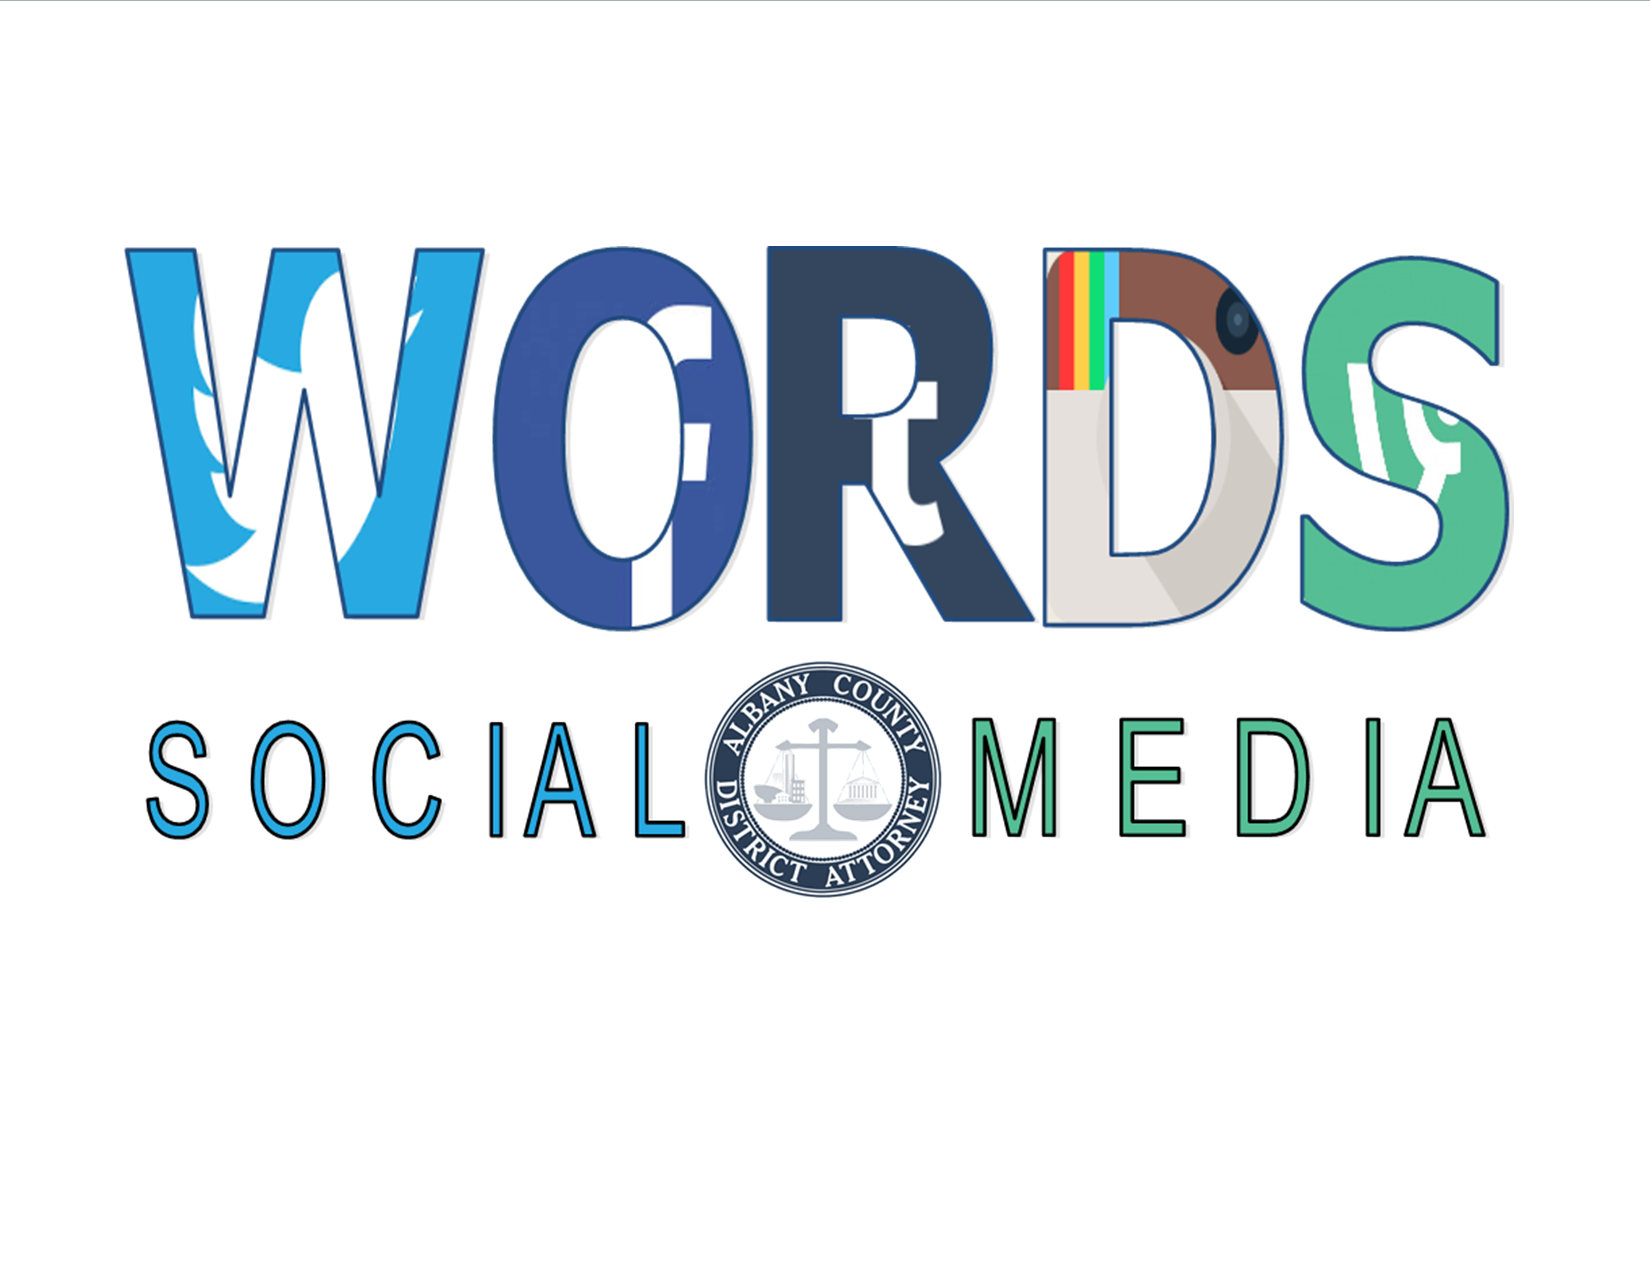 WORDS SOCIAL MEDIA LOGO.png